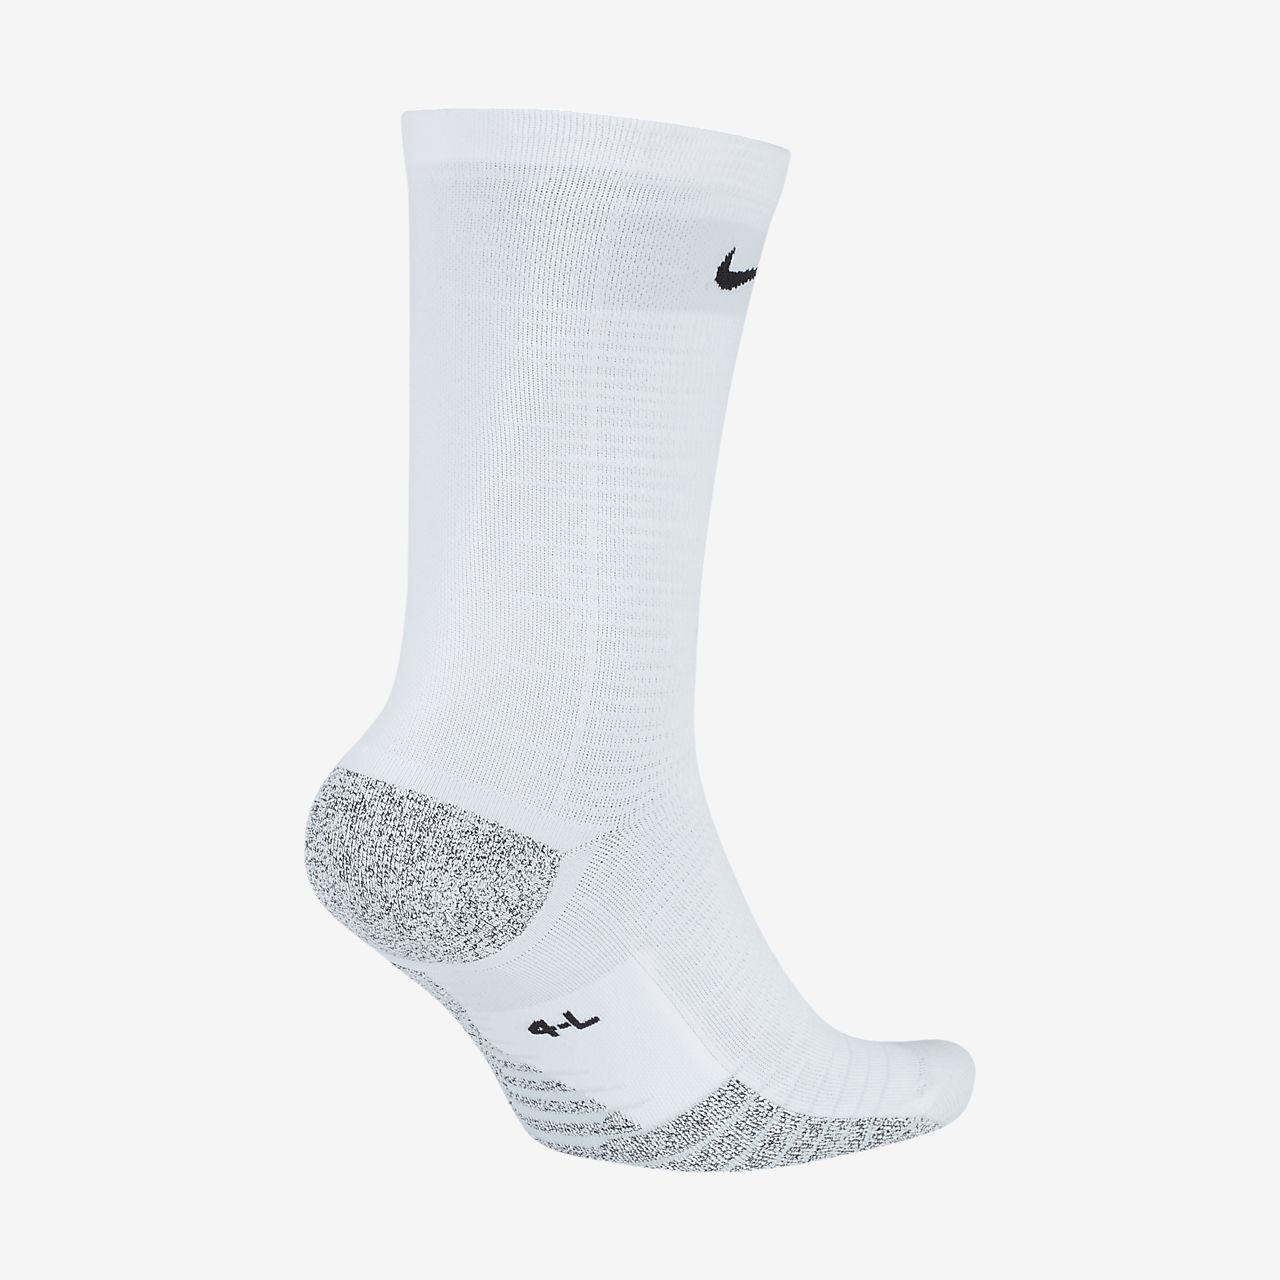 Nike Air Force 1 Crew 2 Pair Calza bianco